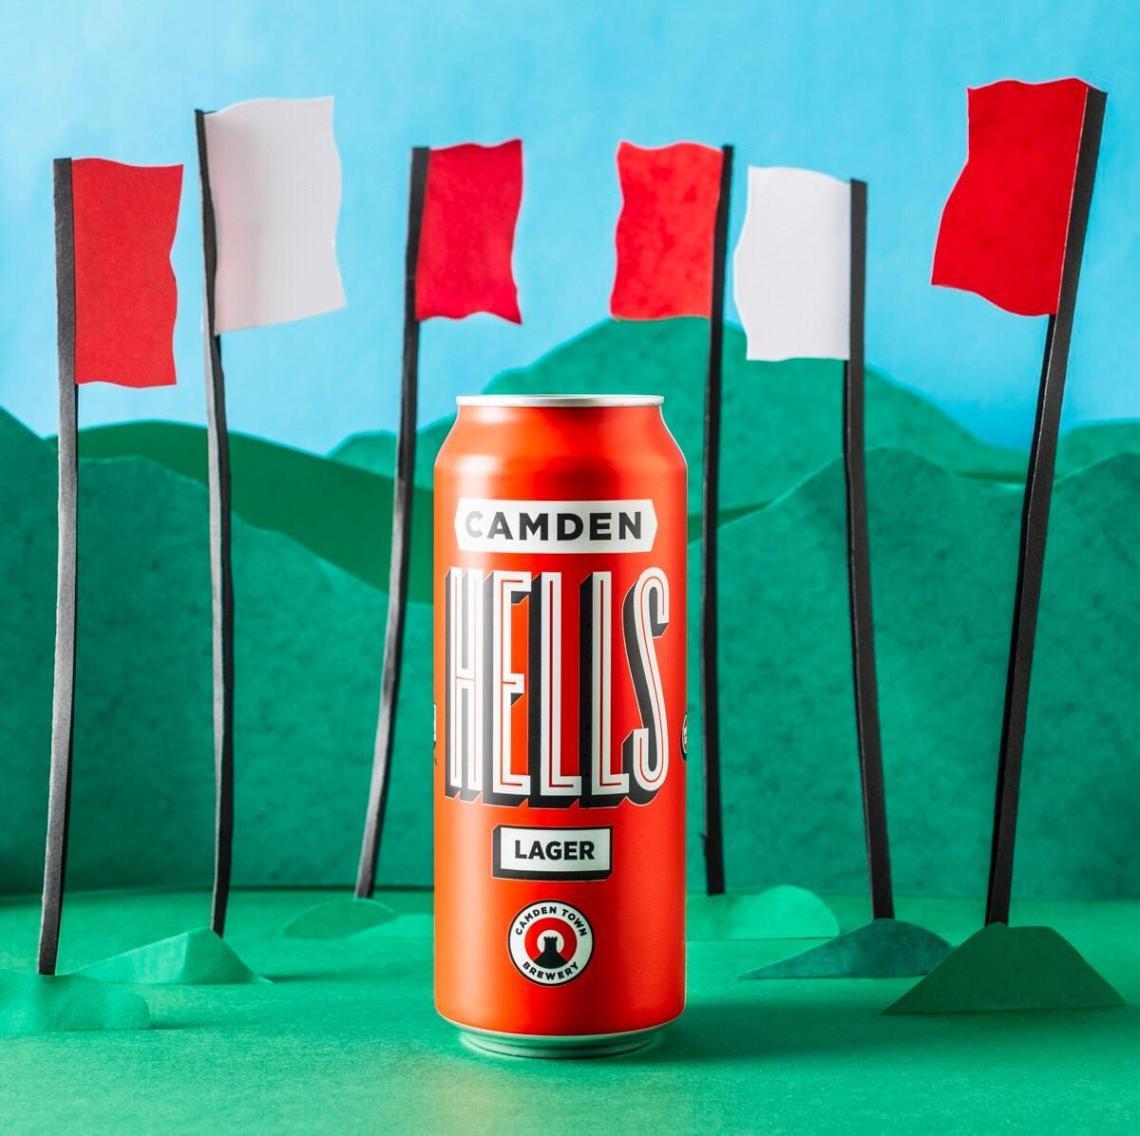 BEER (but bigger)  Launching this weekend at #FieldDayLondon, Camden Town Brewer...